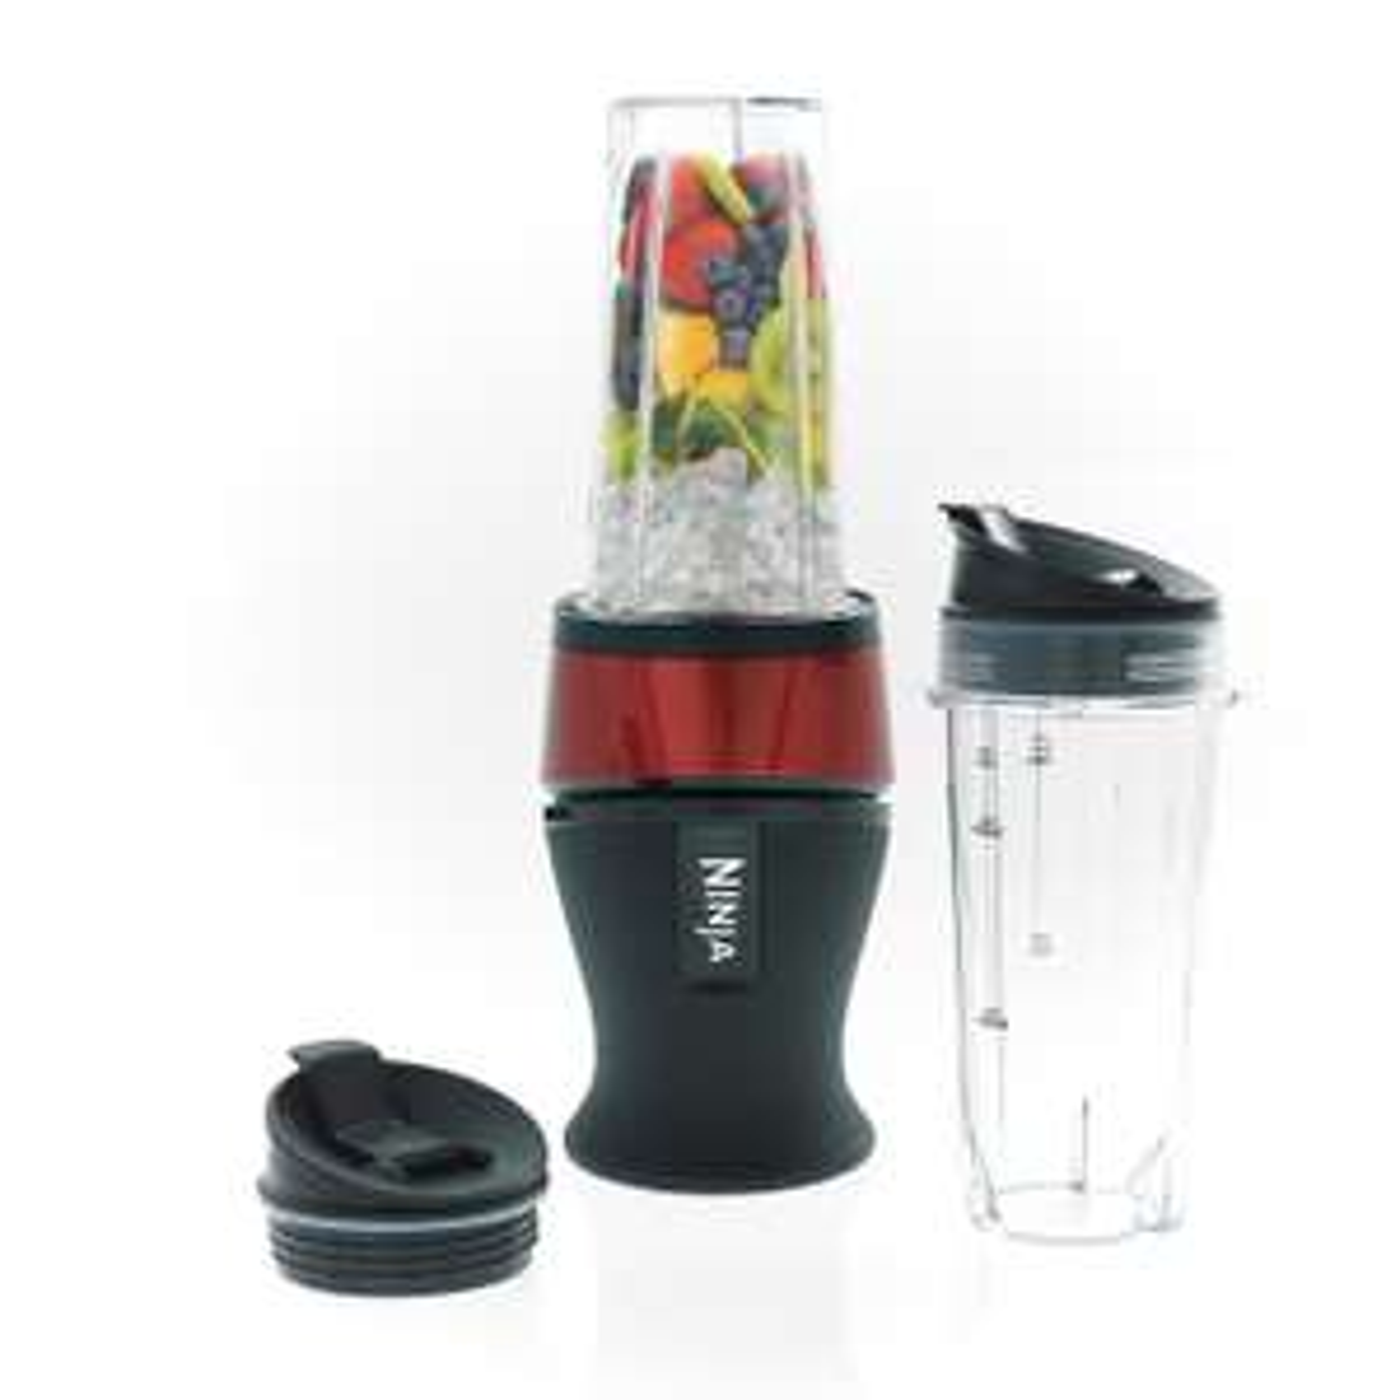 Nutri Ninja 700W Blender & Smoothie Maker – Red £29.99 @ Ninja Kitchen